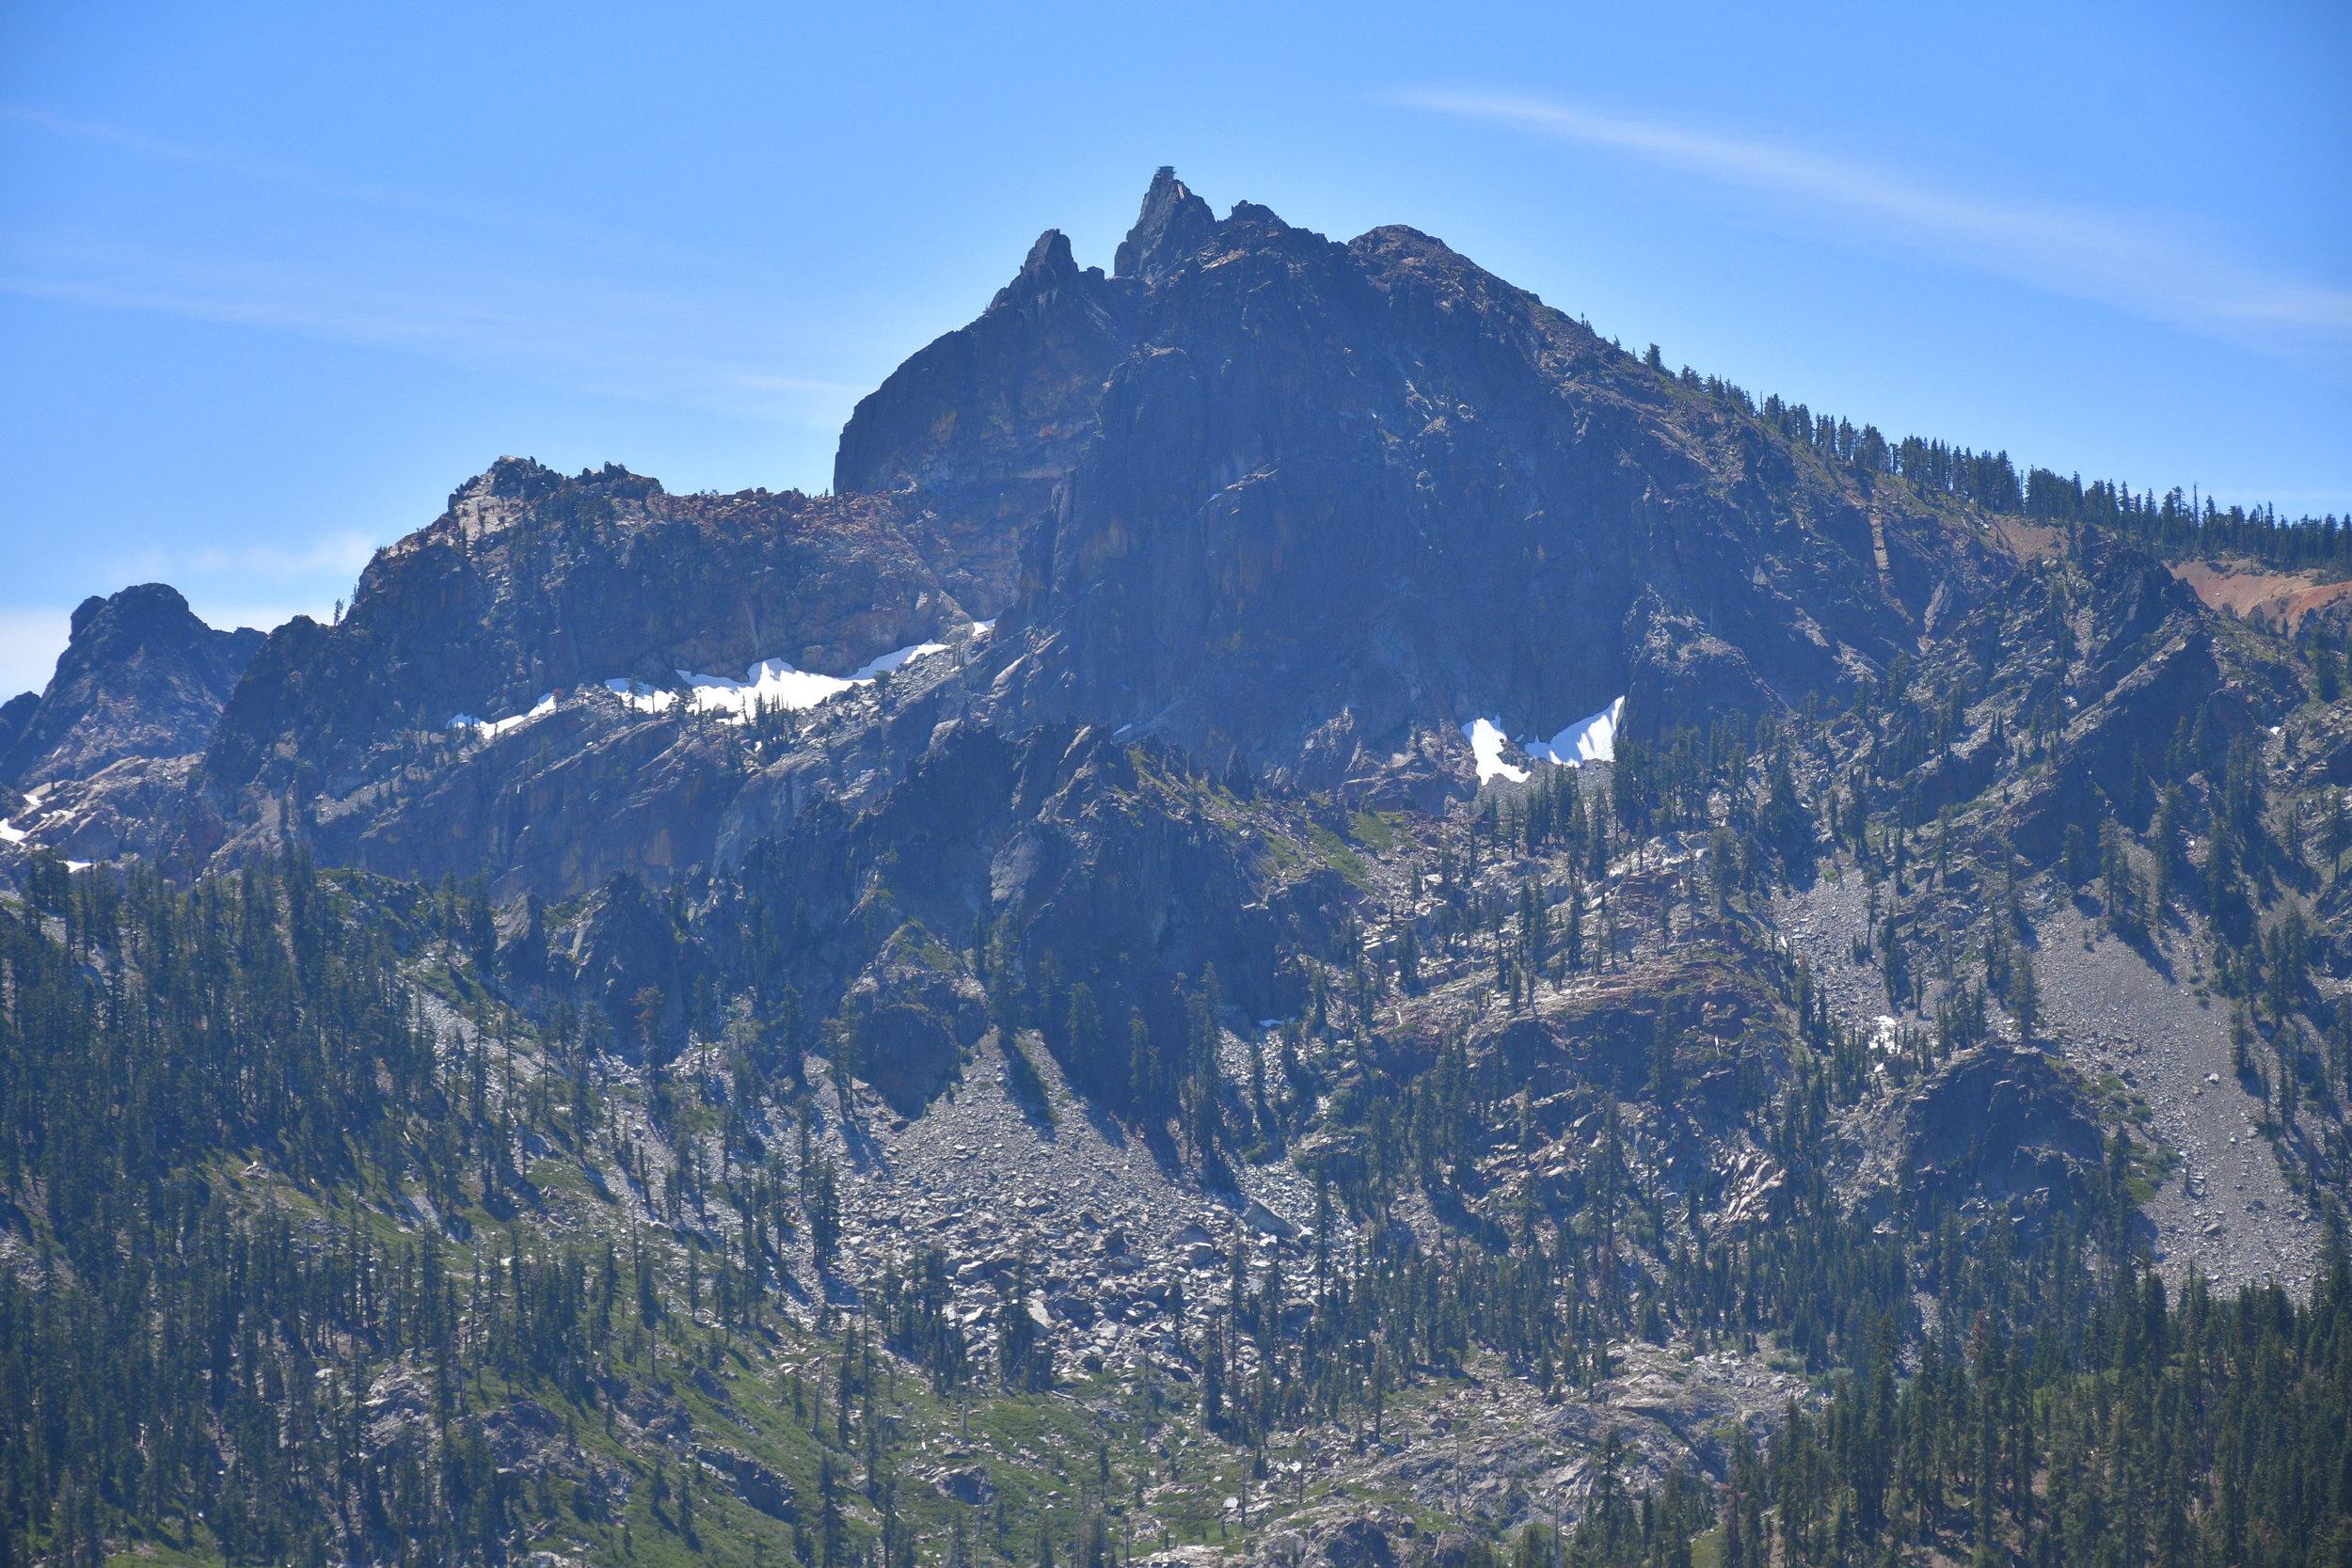 Photo courtesy Sierra Buttes Trail Stewardship